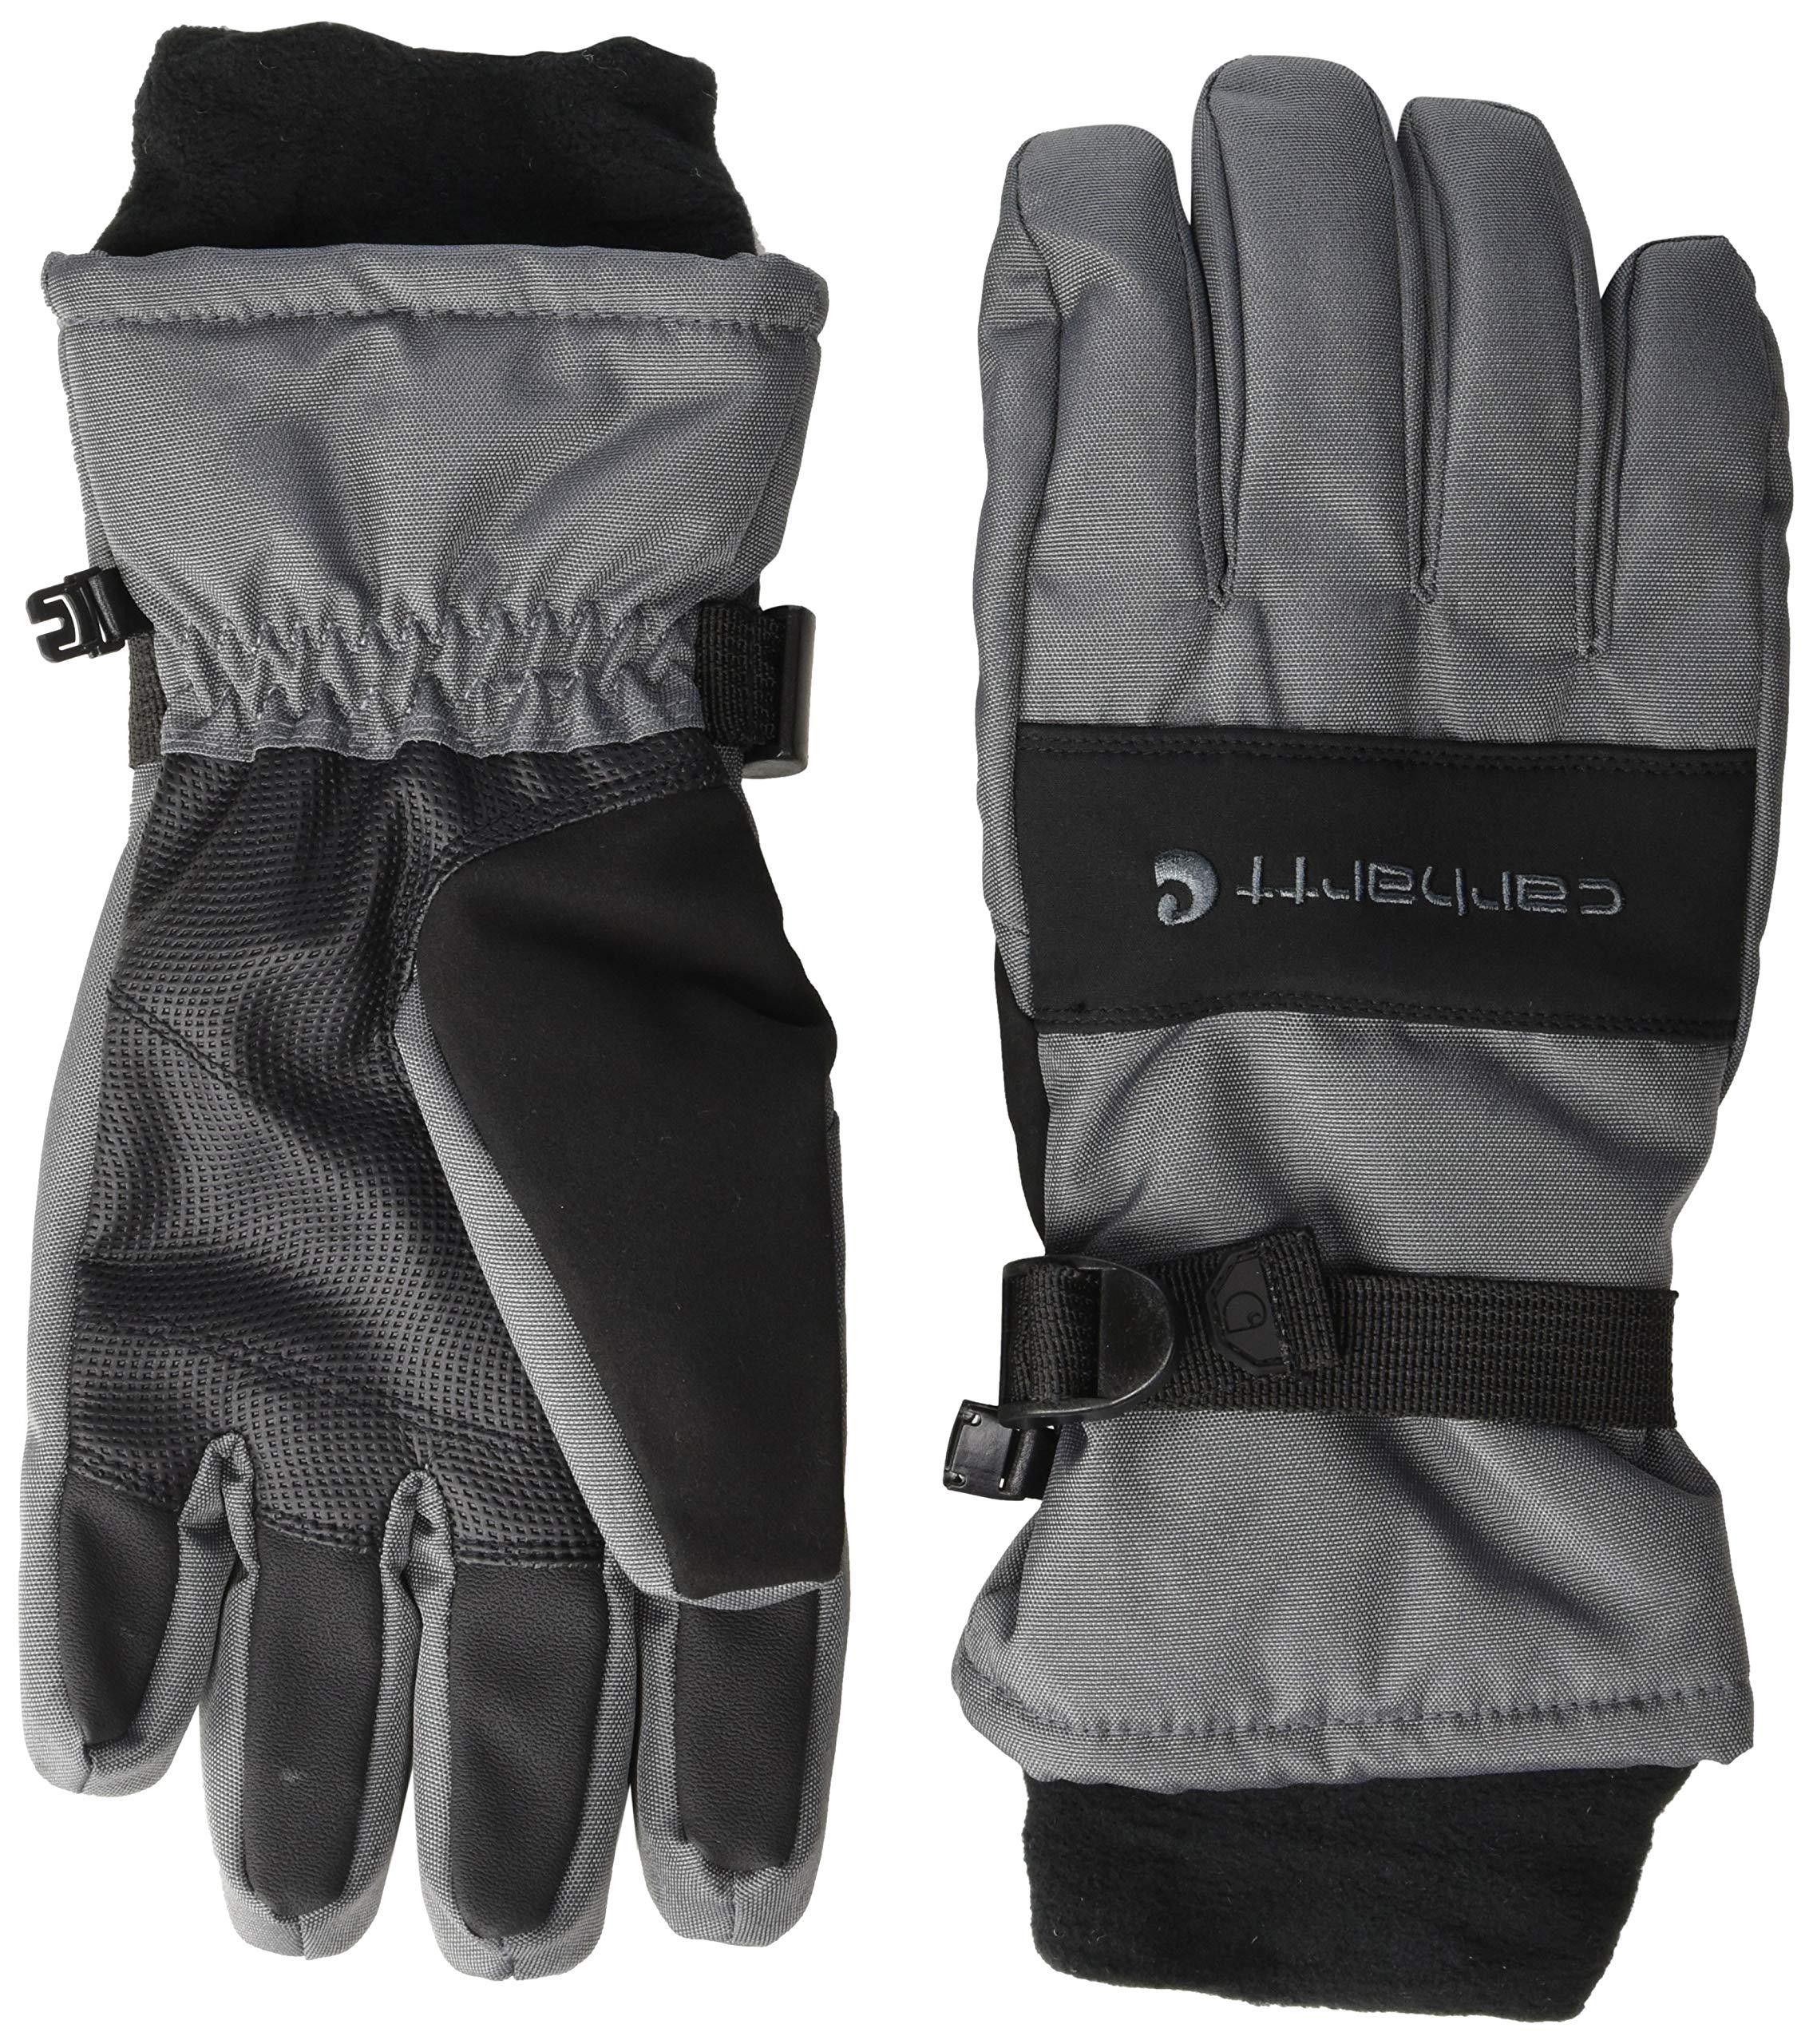 Carhartt Men's W.P. Waterproof Insulated Glove, dark grey/black S